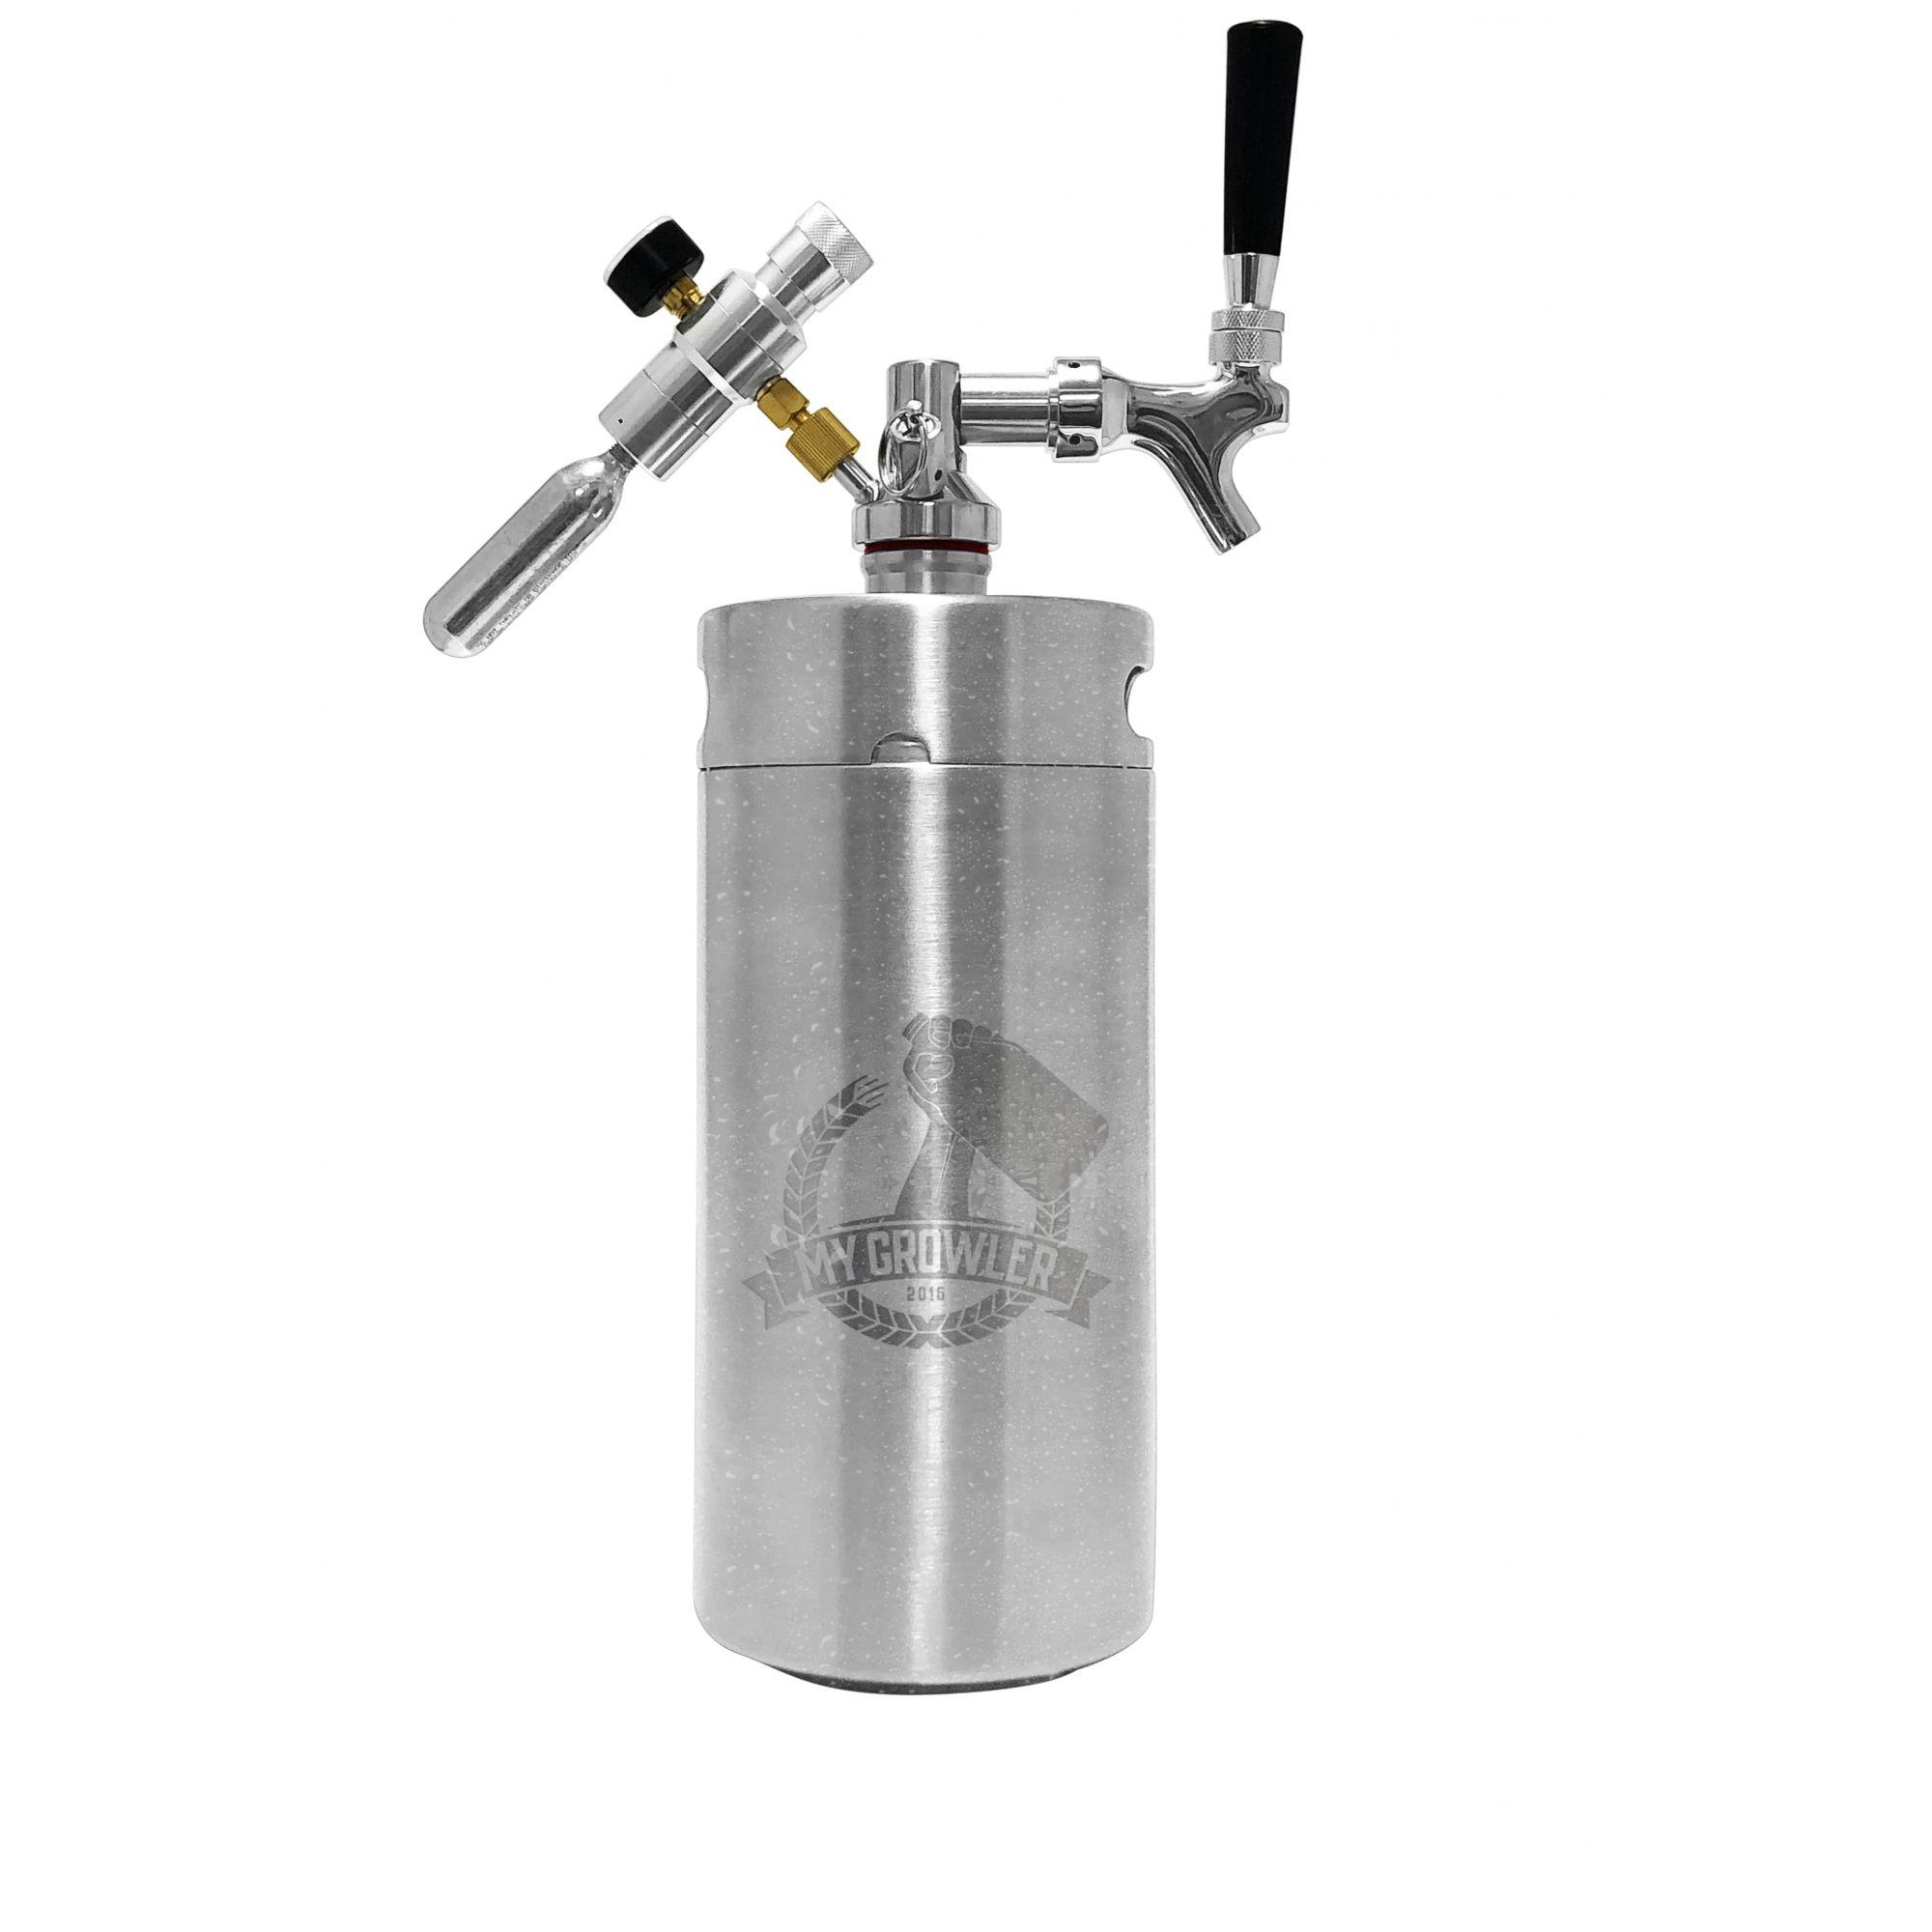 Kit My Keg, Growler Inox 3,8l com torneira americana Standard